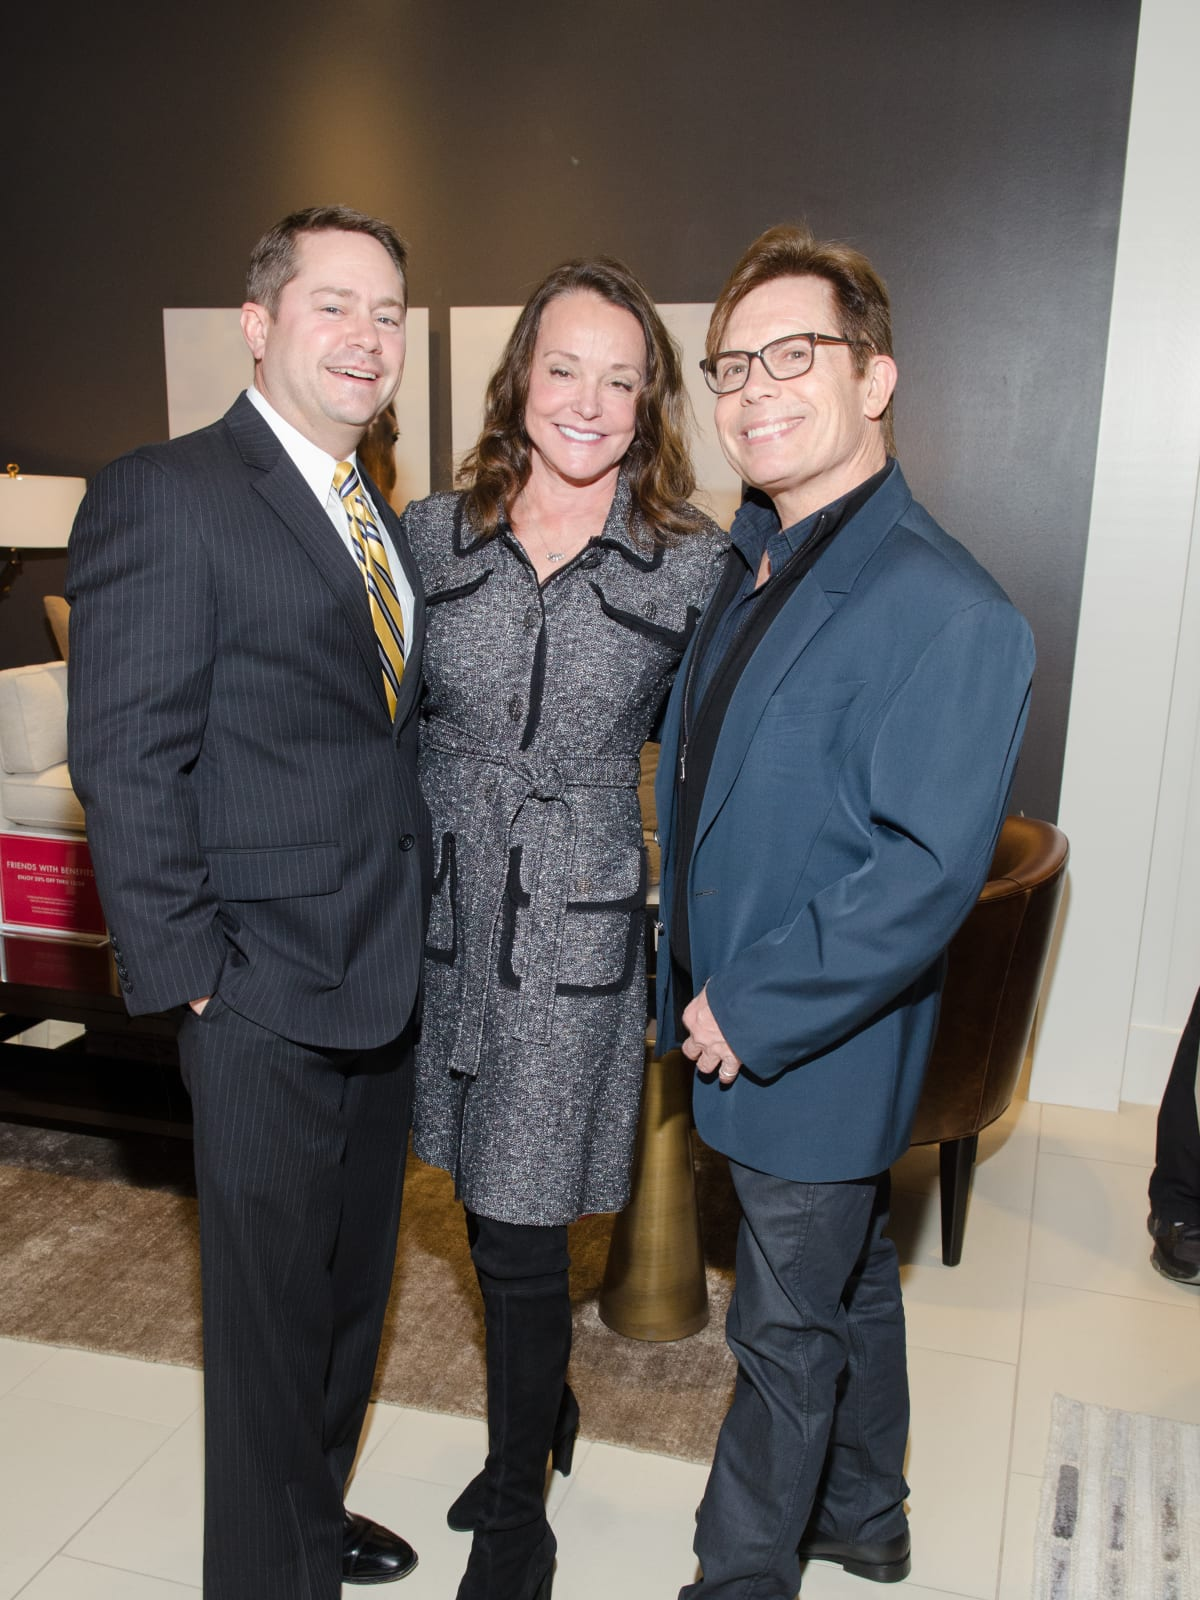 News, PetSet Gifting, Dec. 2015 Brian Williams, Goldie Rose, David Frost